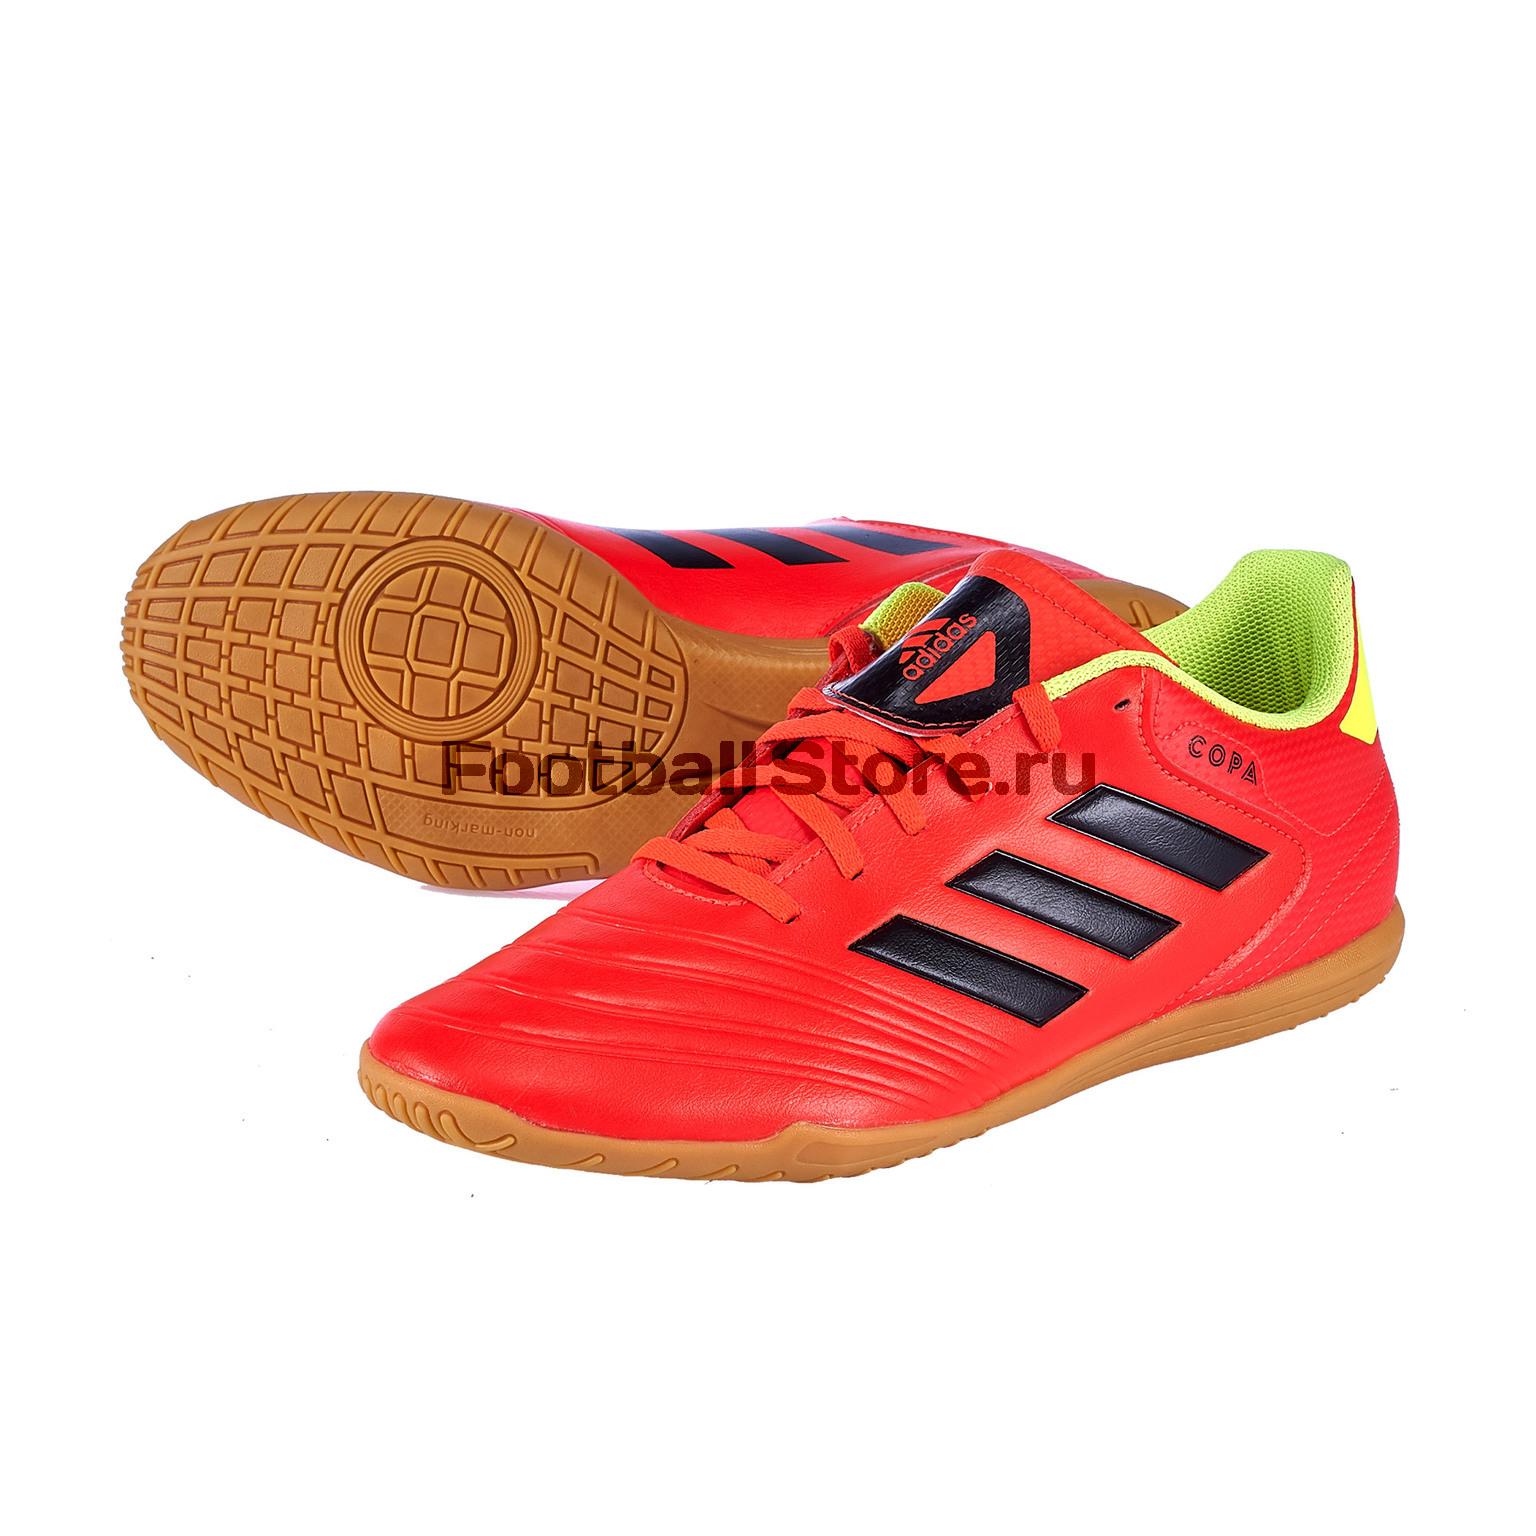 Обувь для зала Adidas Copa Tango 18.4 IN DB2447 обувь для зала adidas ace tango 18 3 in jr cp9075